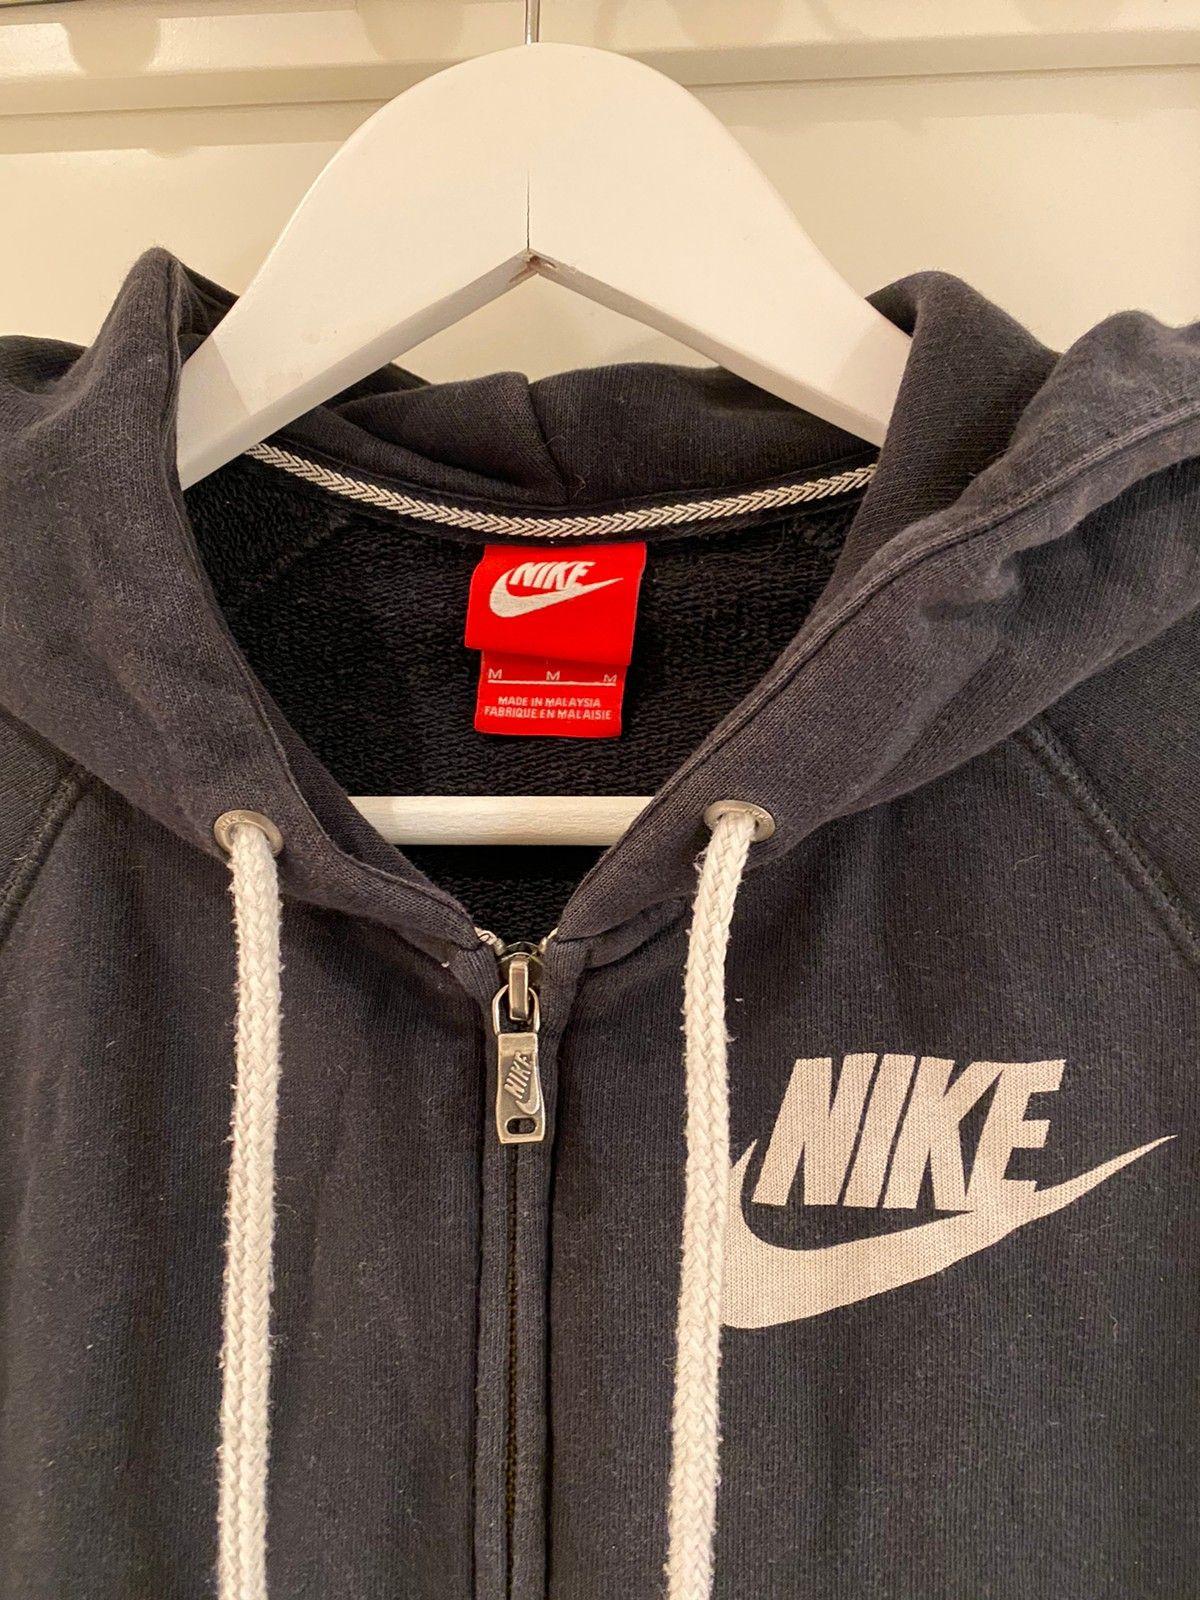 Nike klespakke + joggesko   FINN.no